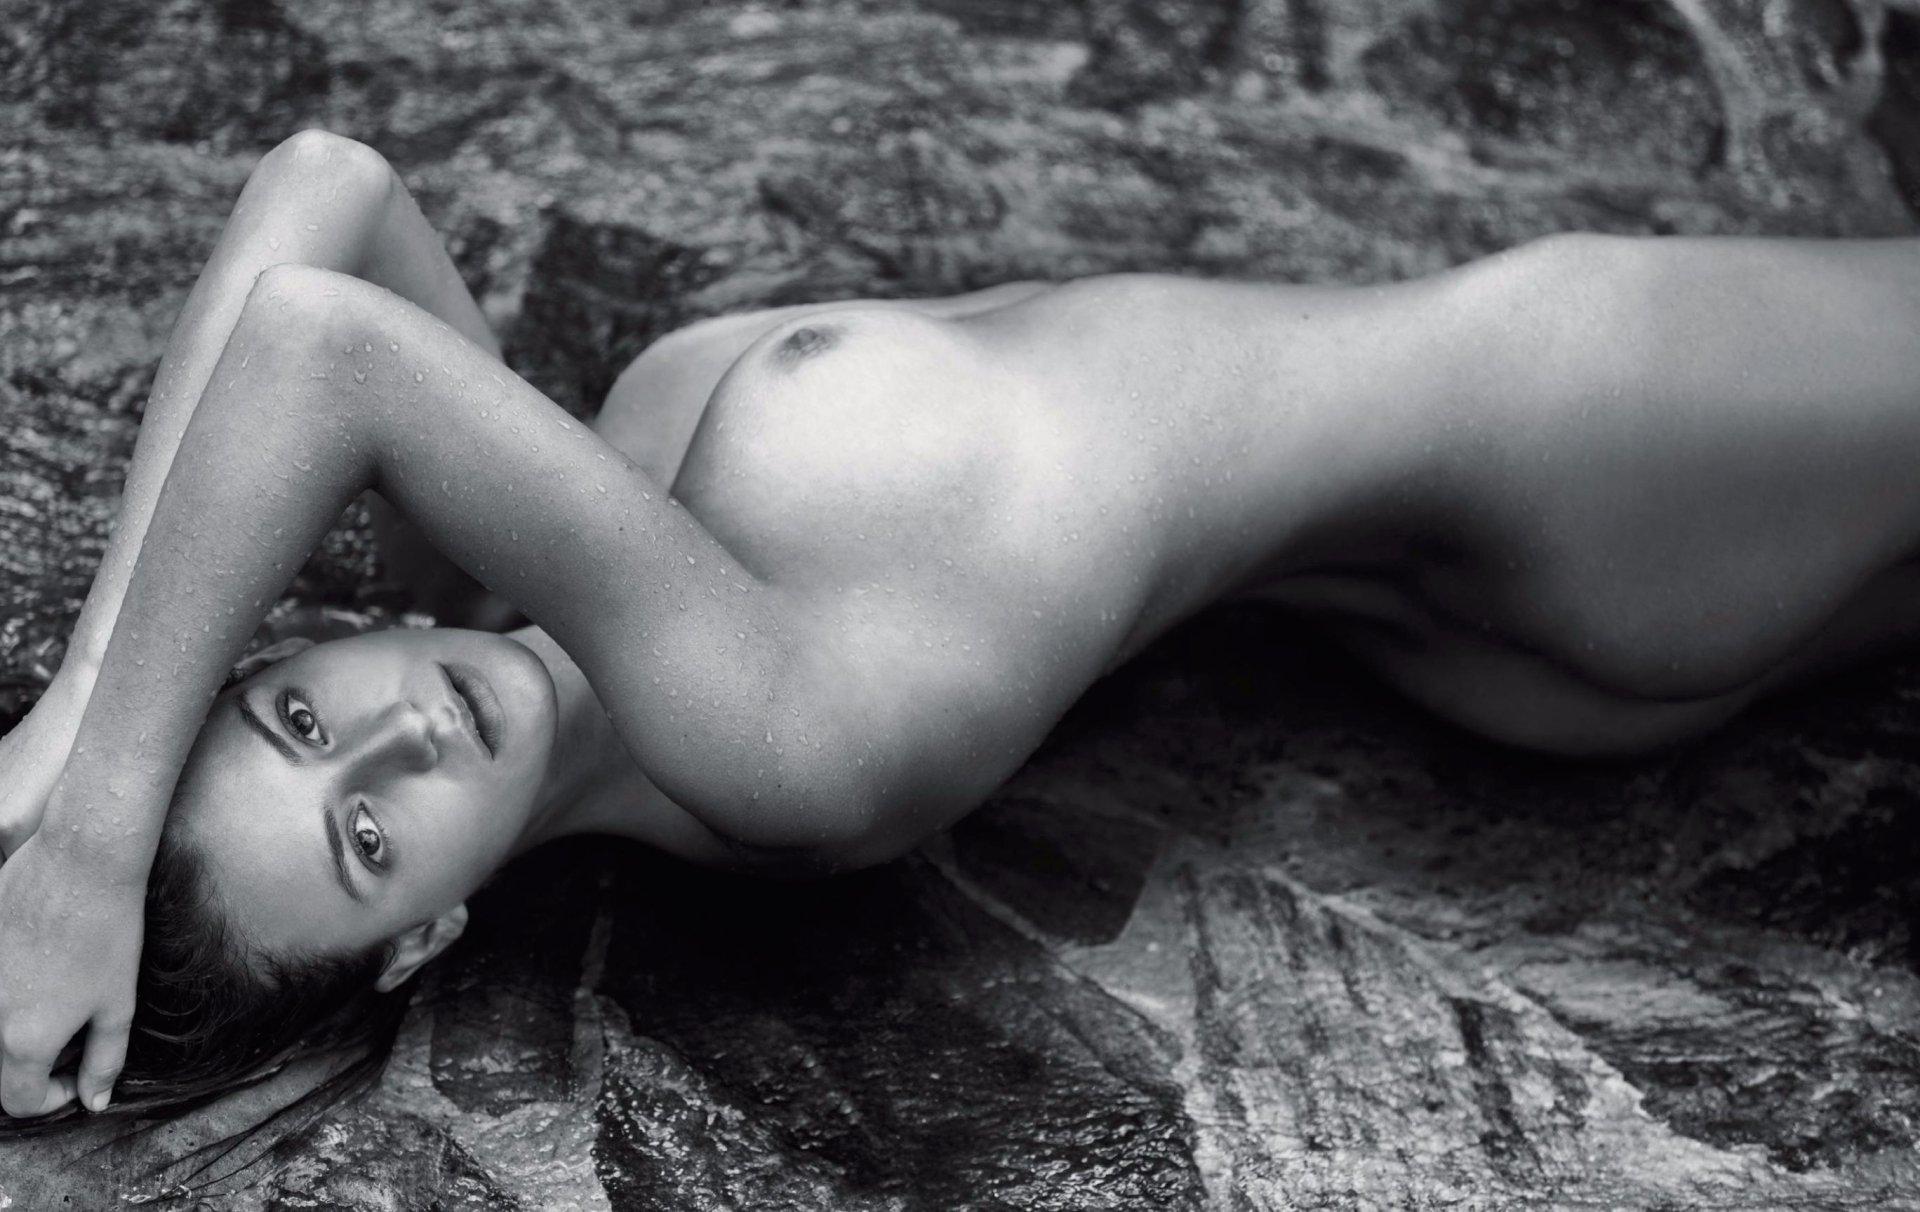 Cleo magazine centrefold nude